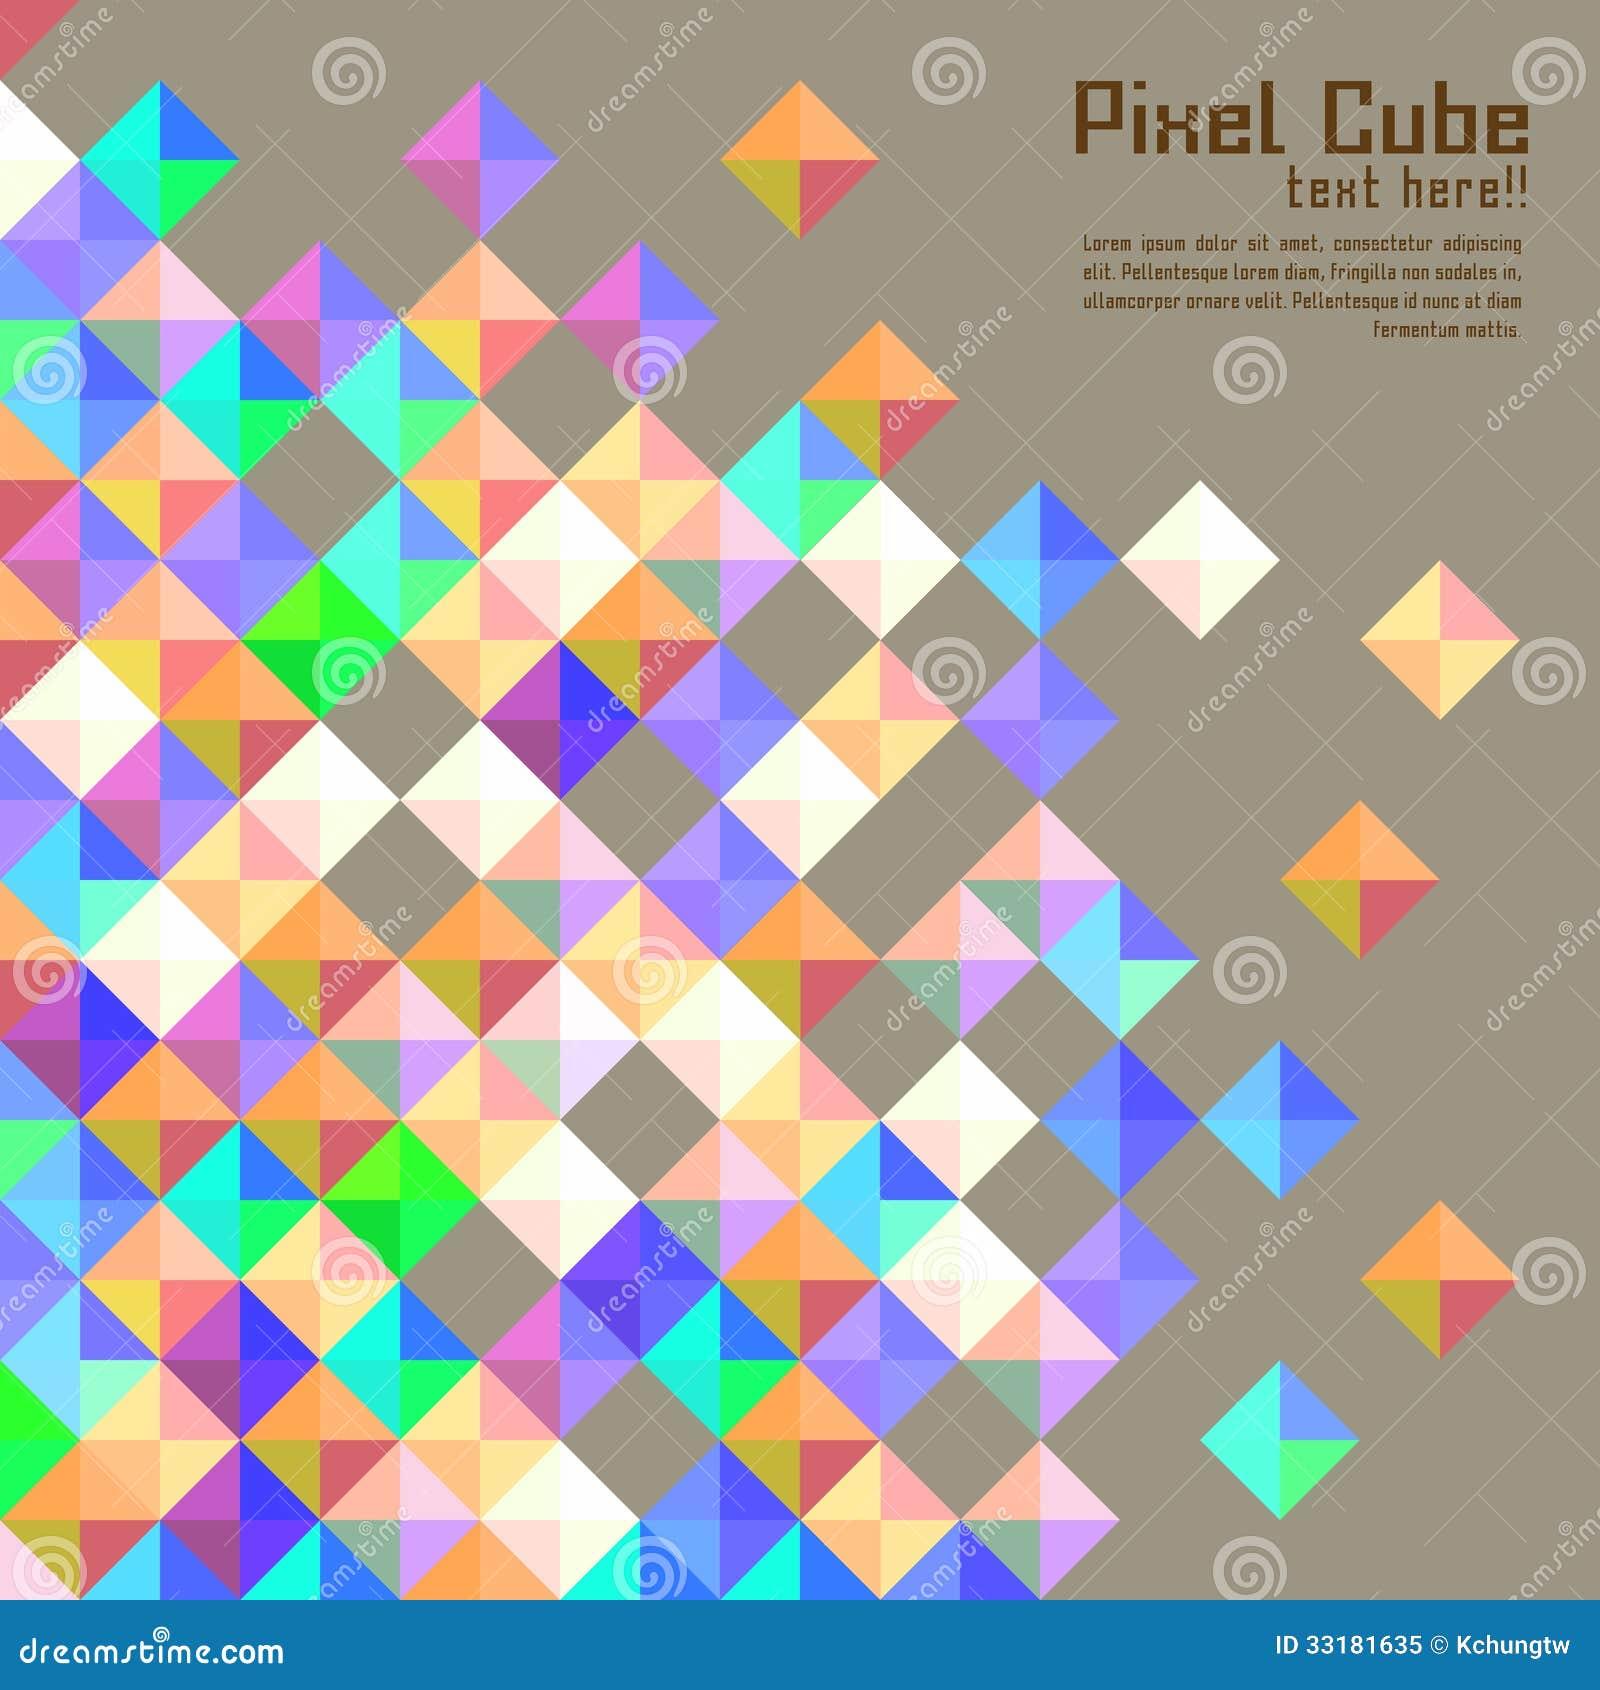 background modern pixel wallpaper - photo #2